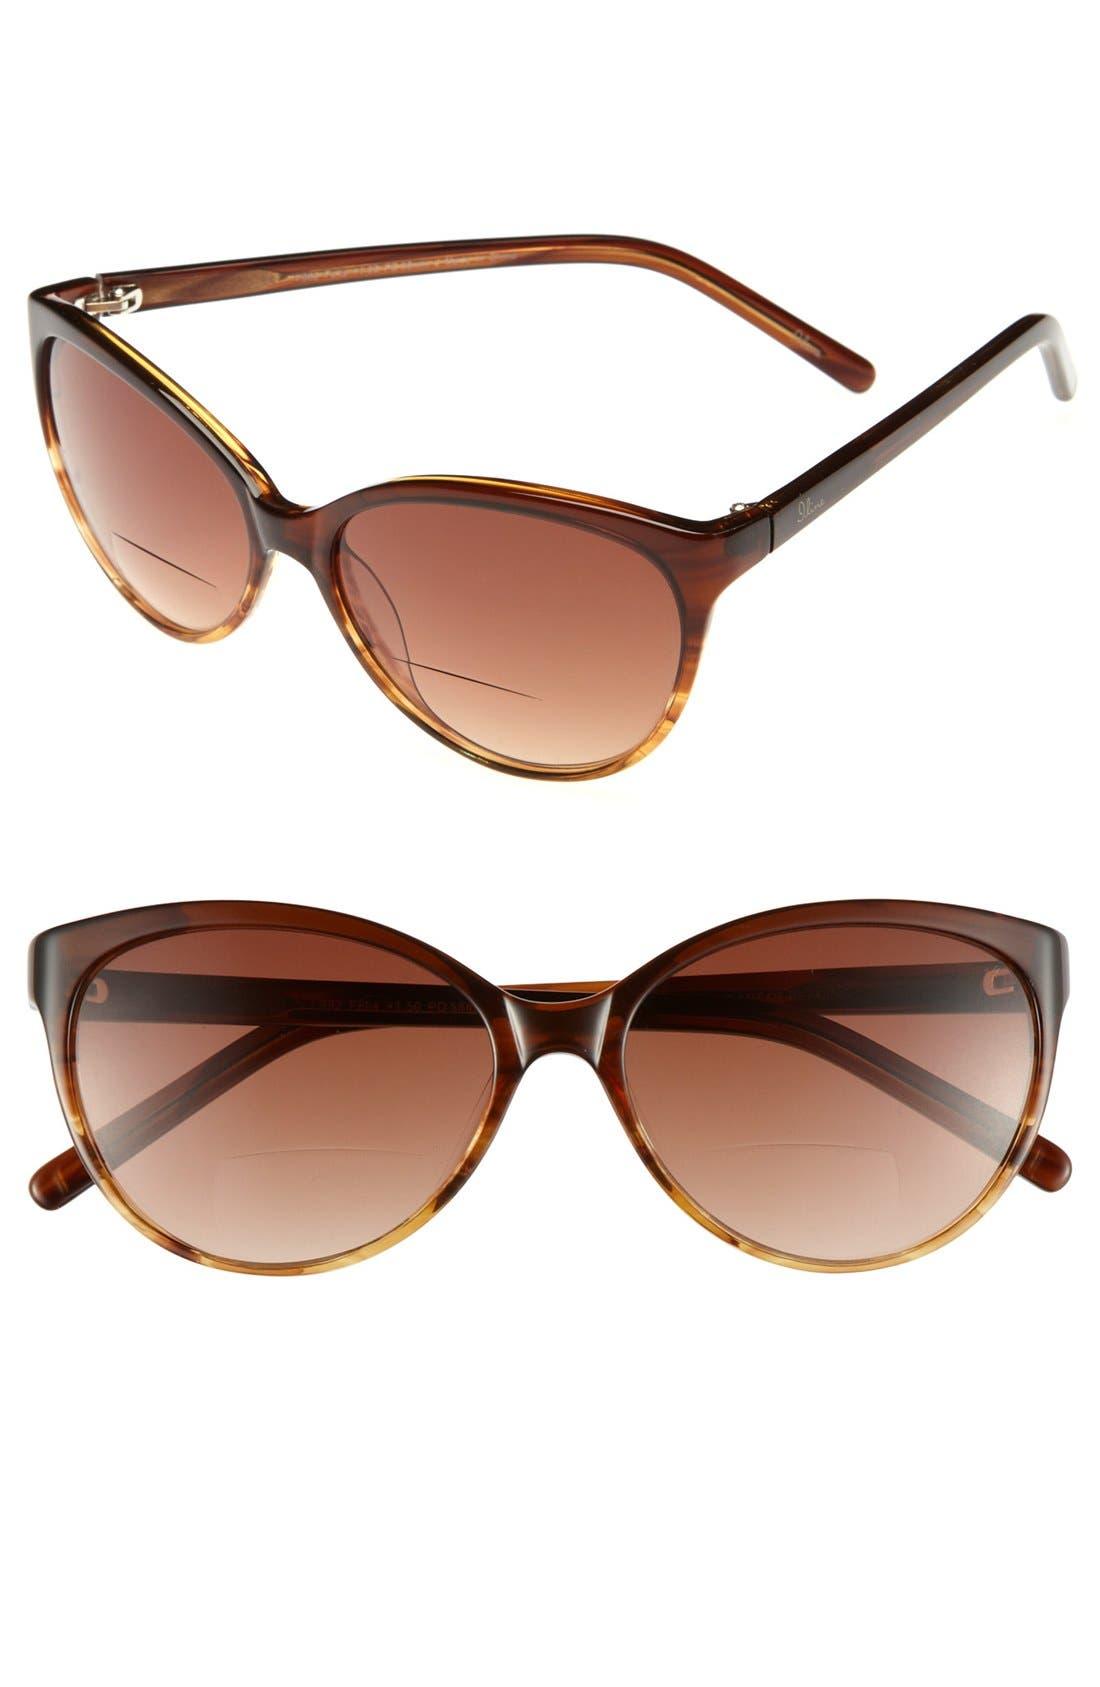 Alternate Image 1 Selected - I Line Eyewear 'Felis' Reading Sunglasses